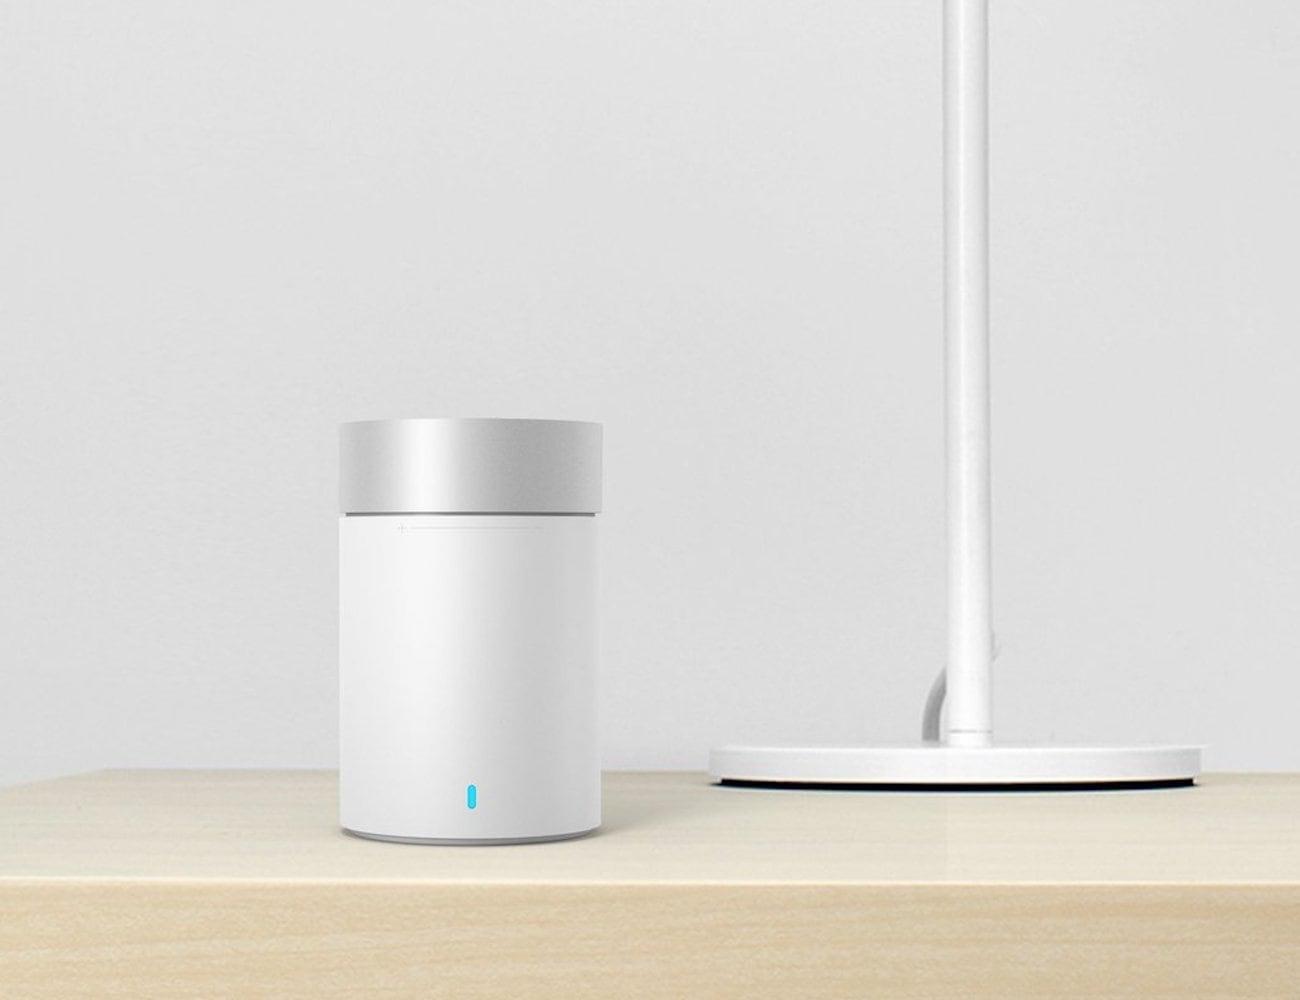 Best portable Bluetooth speakers of %curren_year% - ZMI SoundCannon